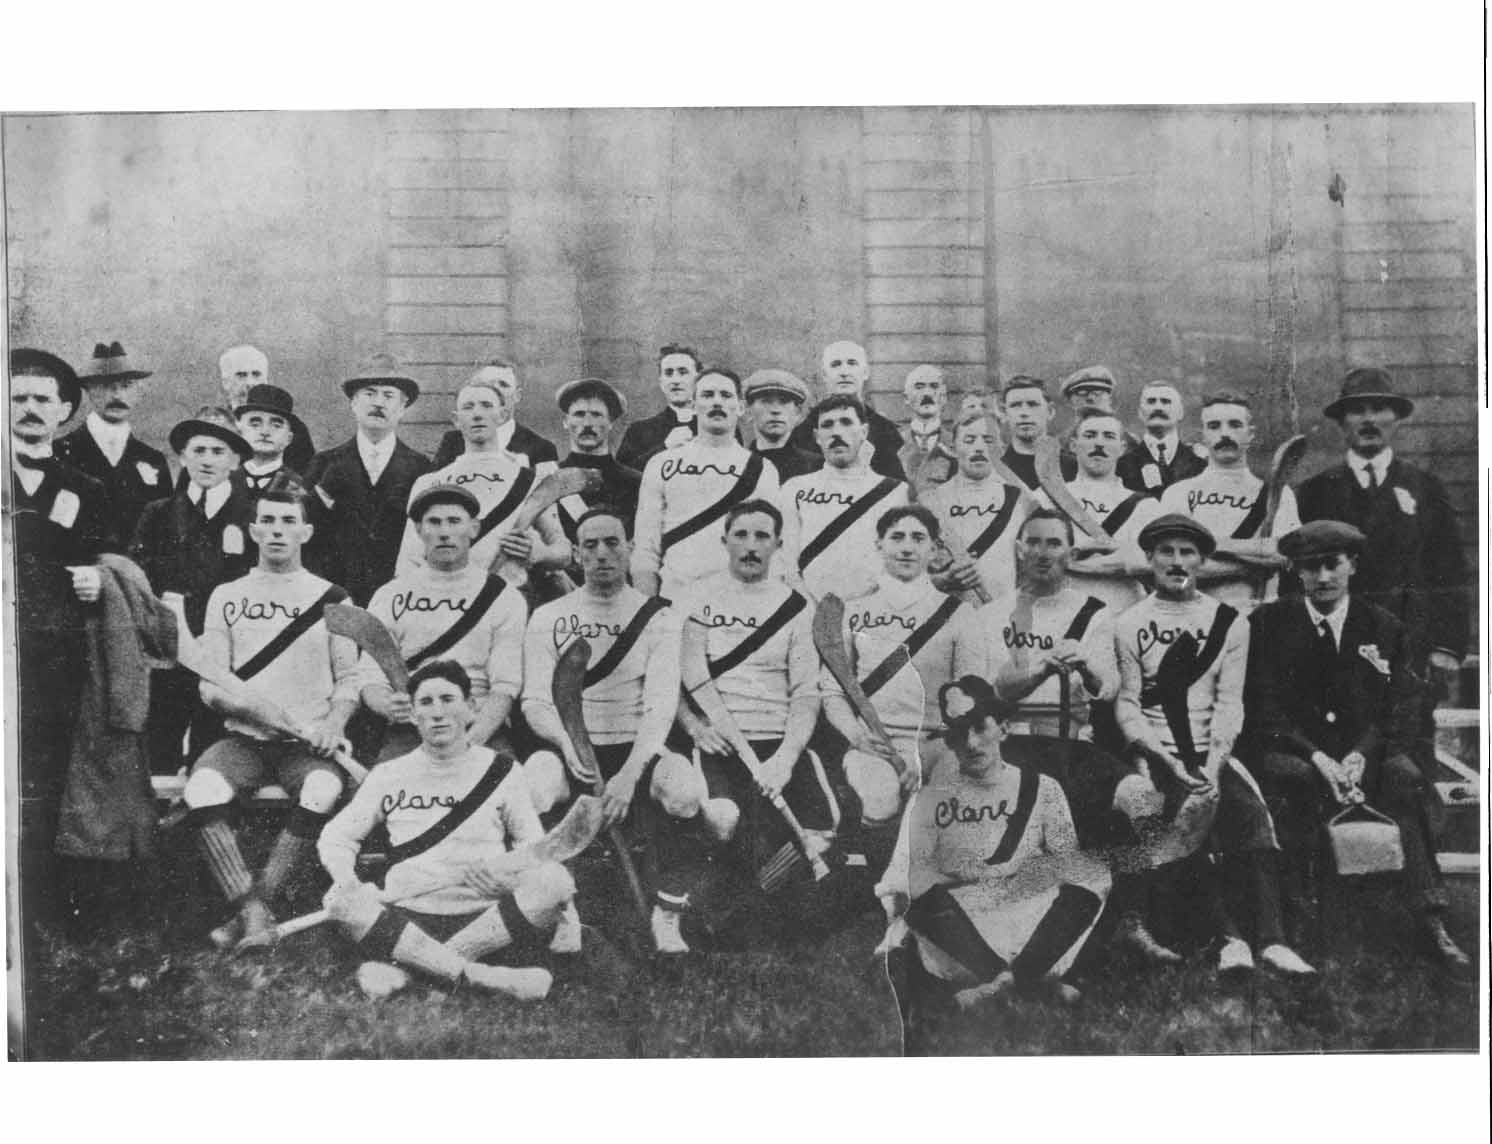 Clare (Quin) 1914 Hurling All-Ireland Champions